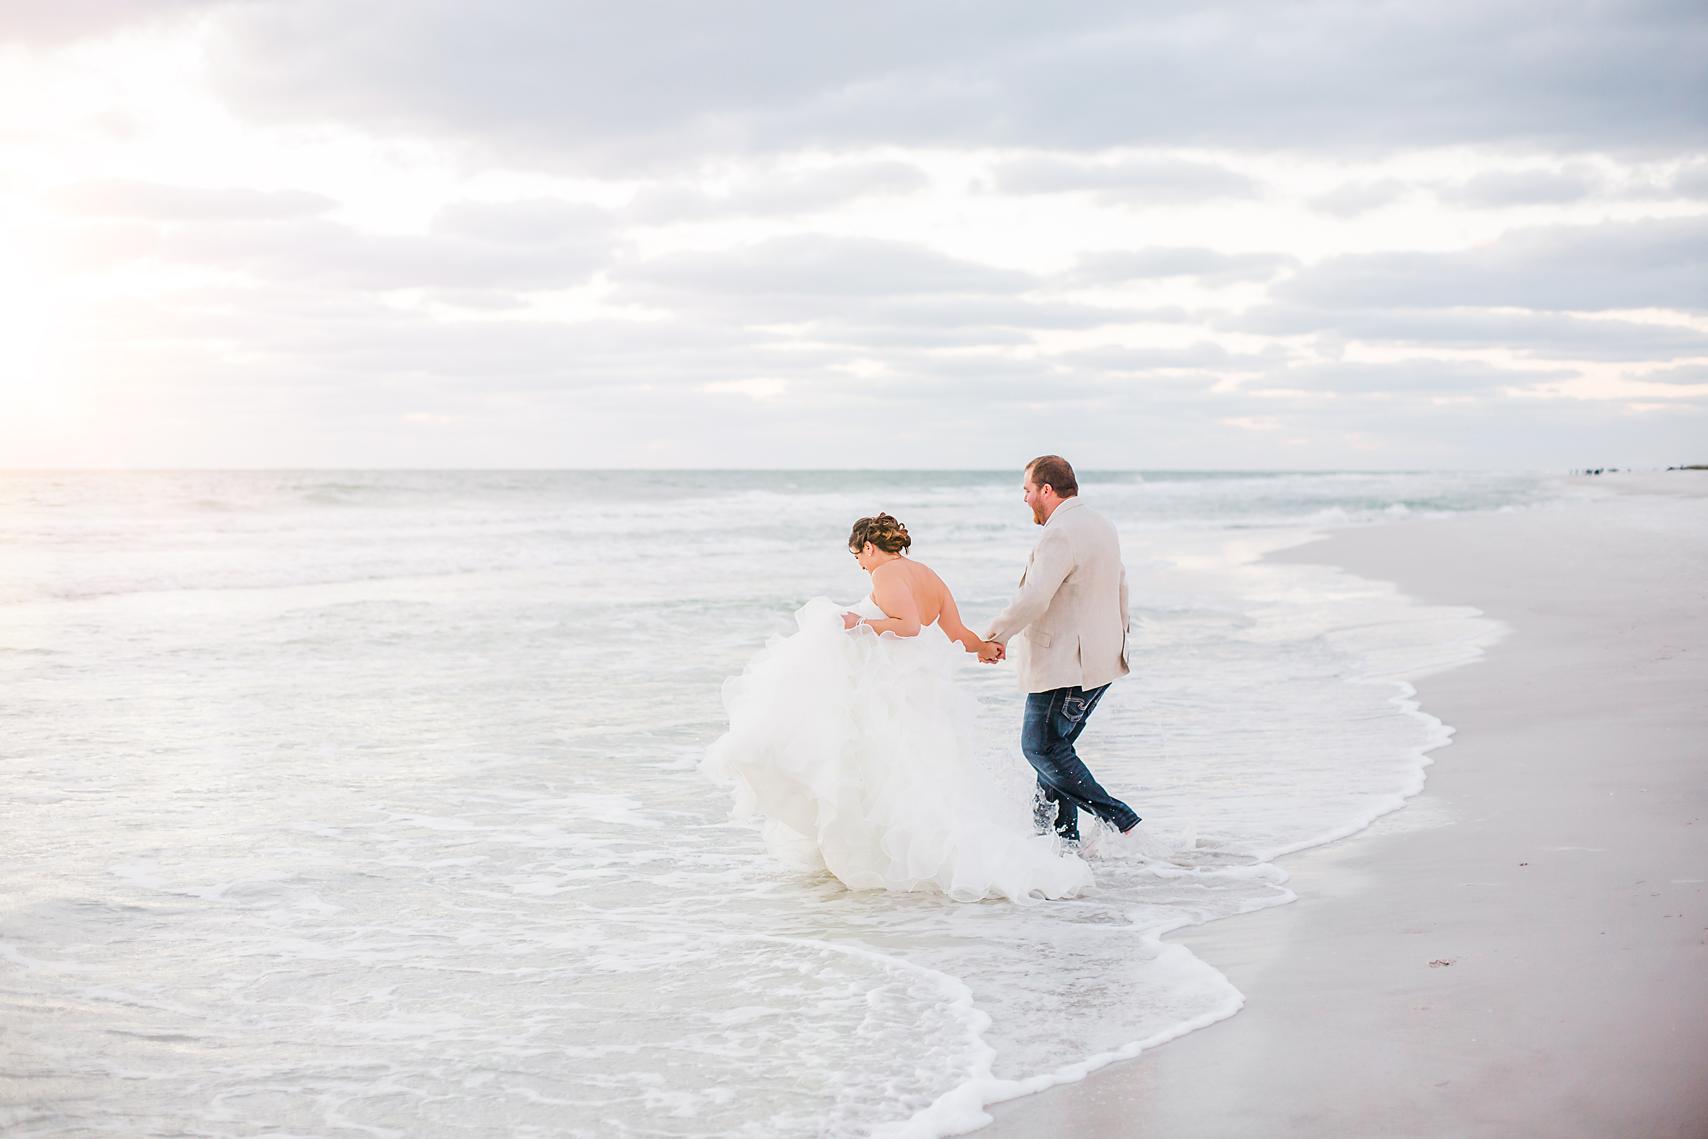 Bailey + Chalin - Anna Maria Island Wedding Photographer - Destination Wedding Photography - Emily & Co. Photography - Beach Wedding Photography 197.jpg